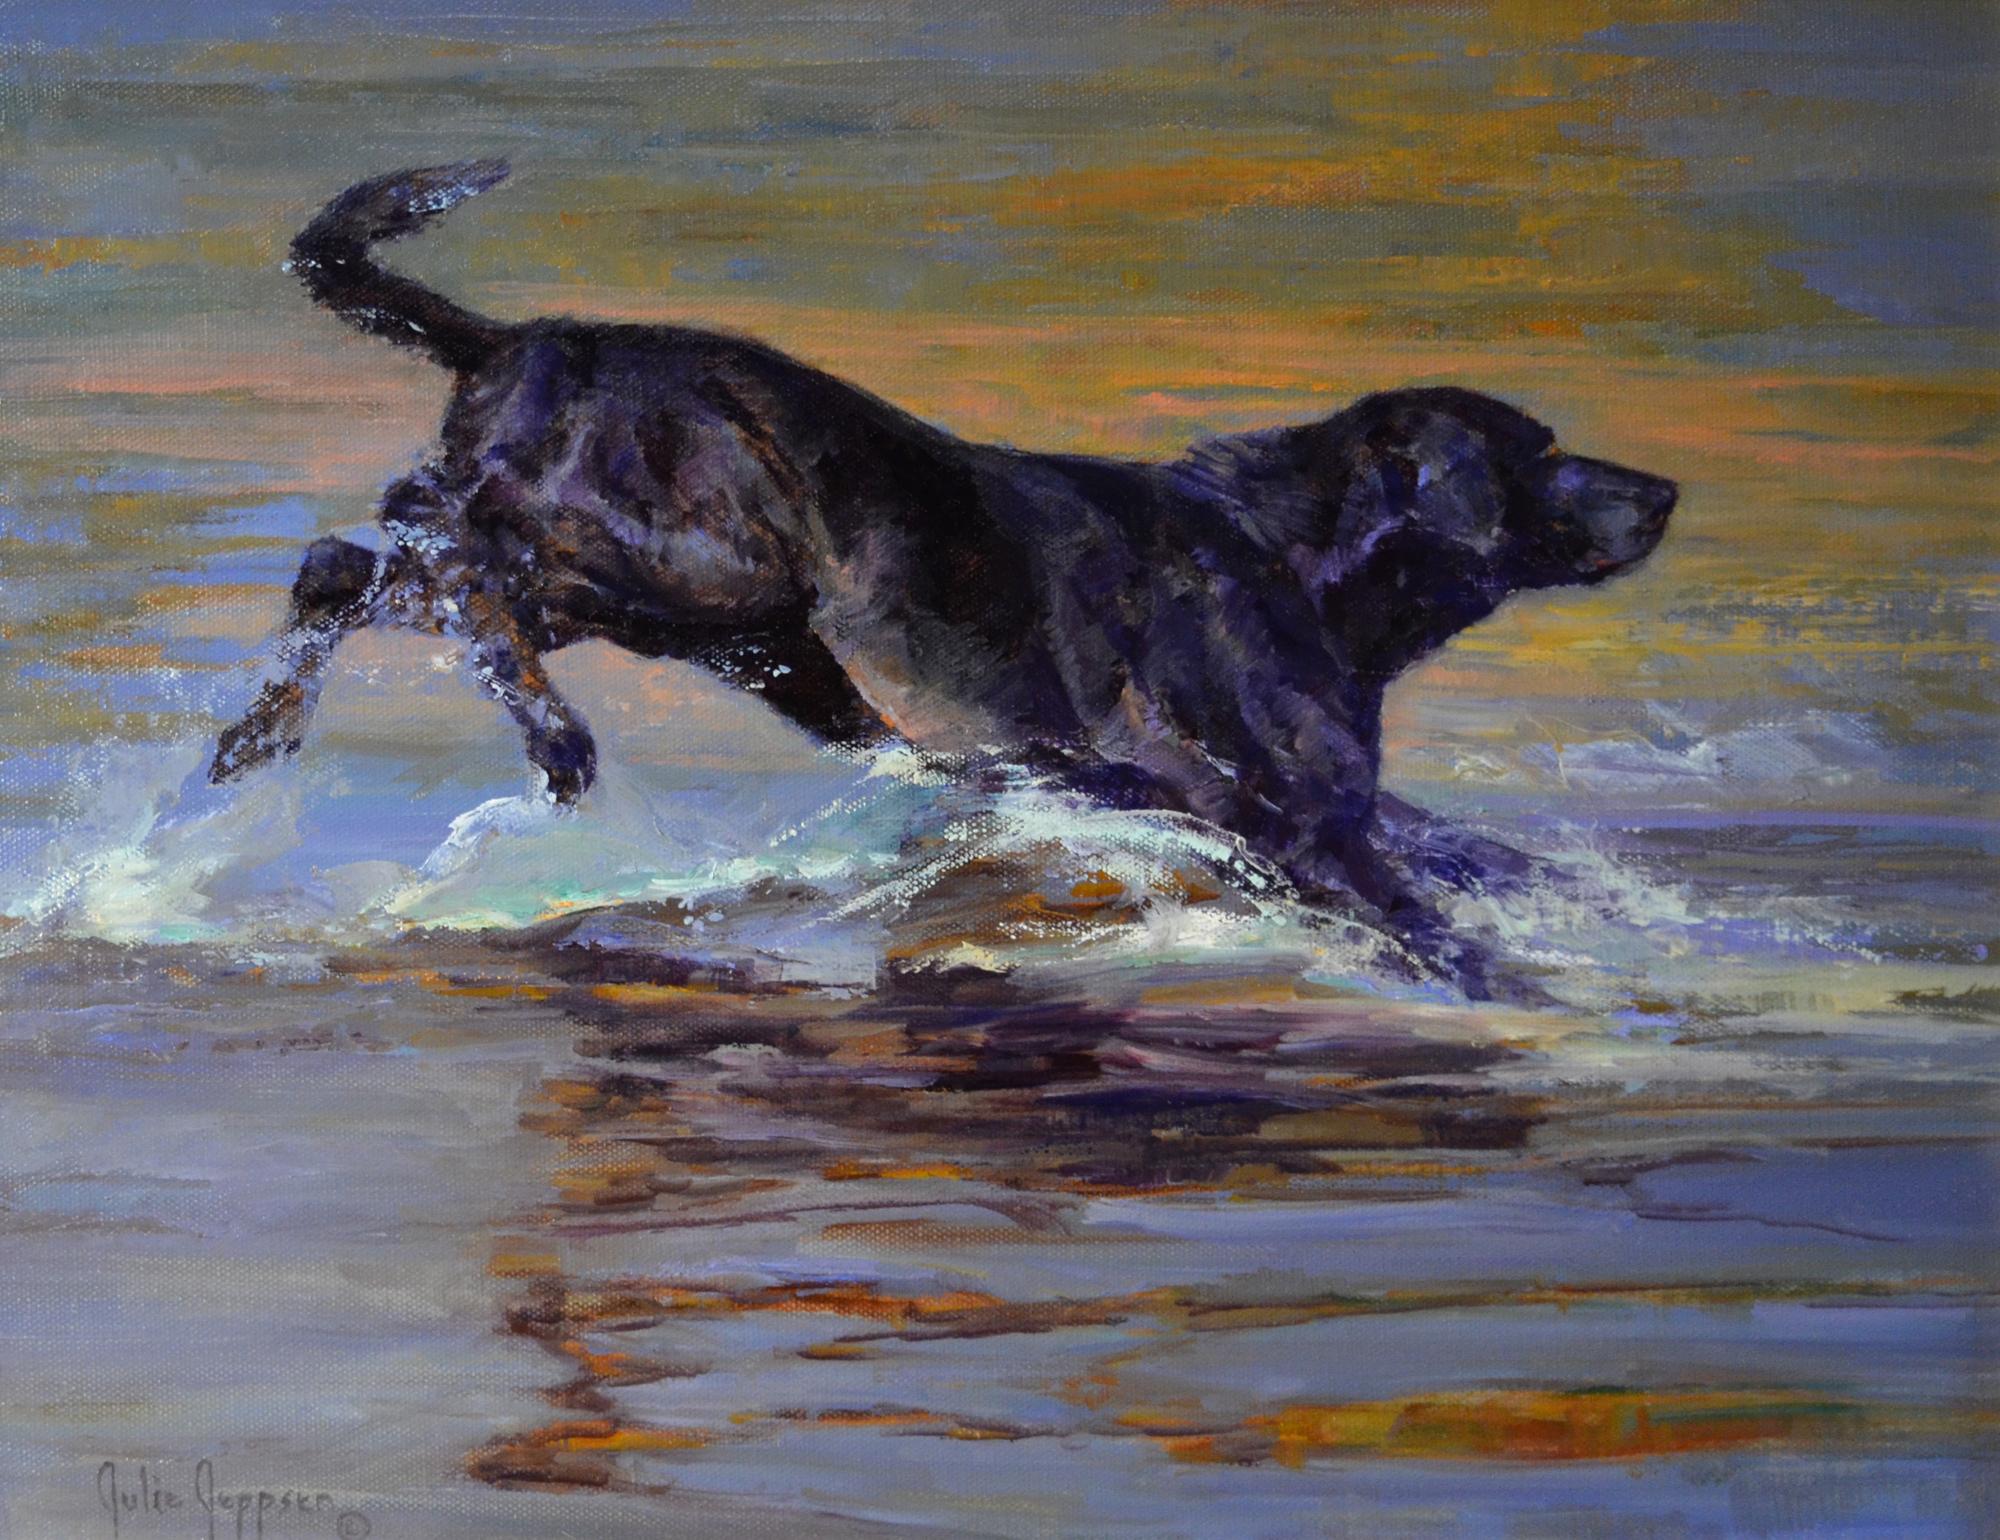 Black Splash by Julie Jeppsen